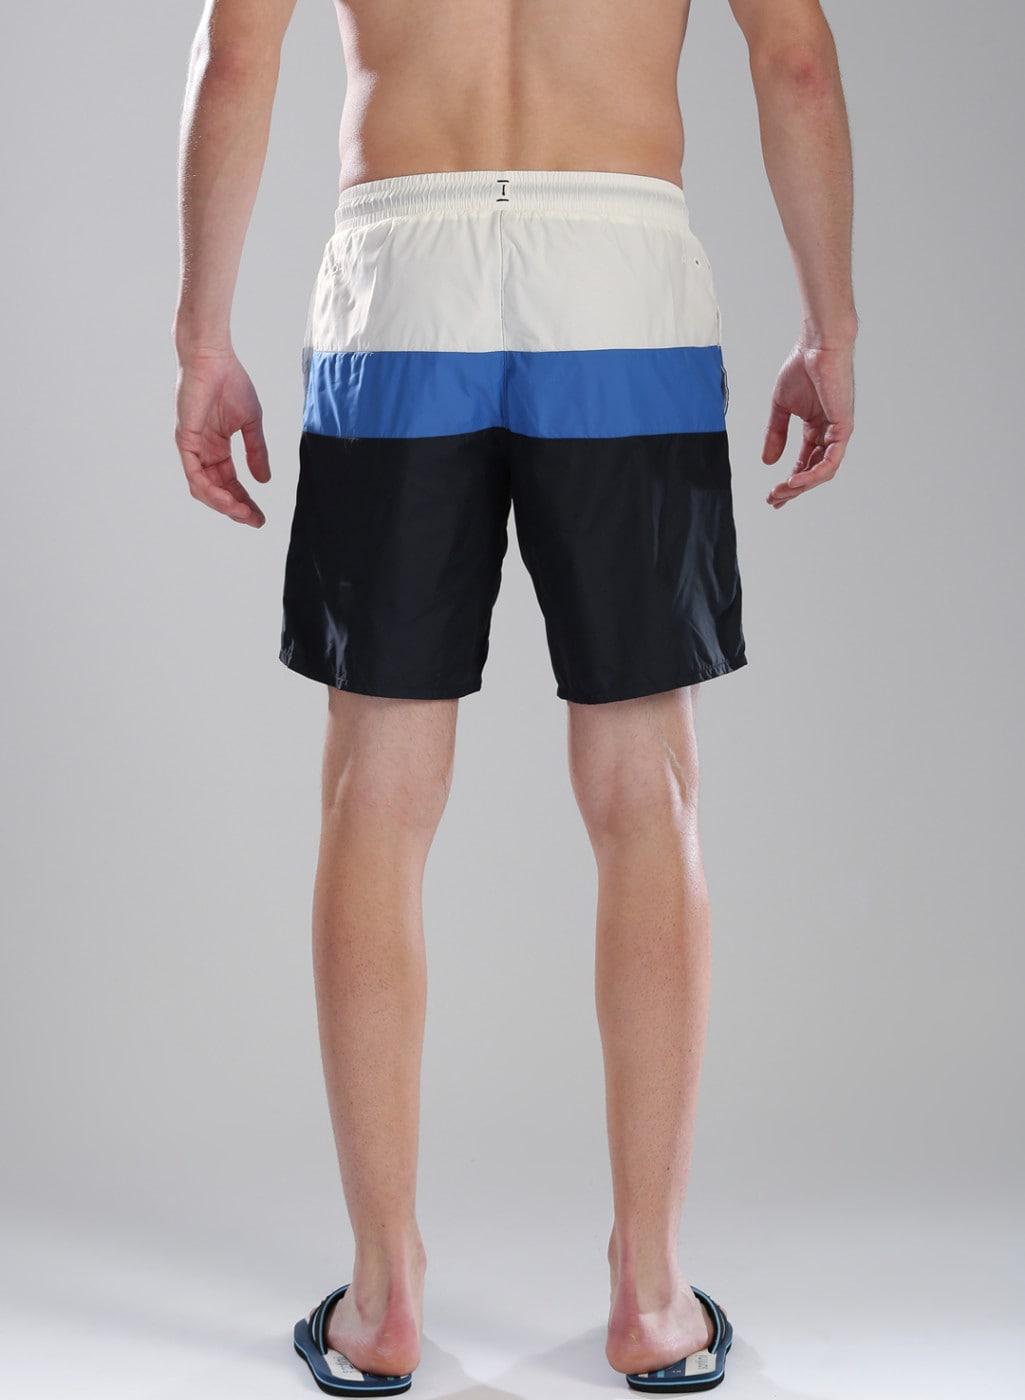 1aecd6f8 Kappa Navy Blue & White Colourblocked BLOK POOL Swim Shorts